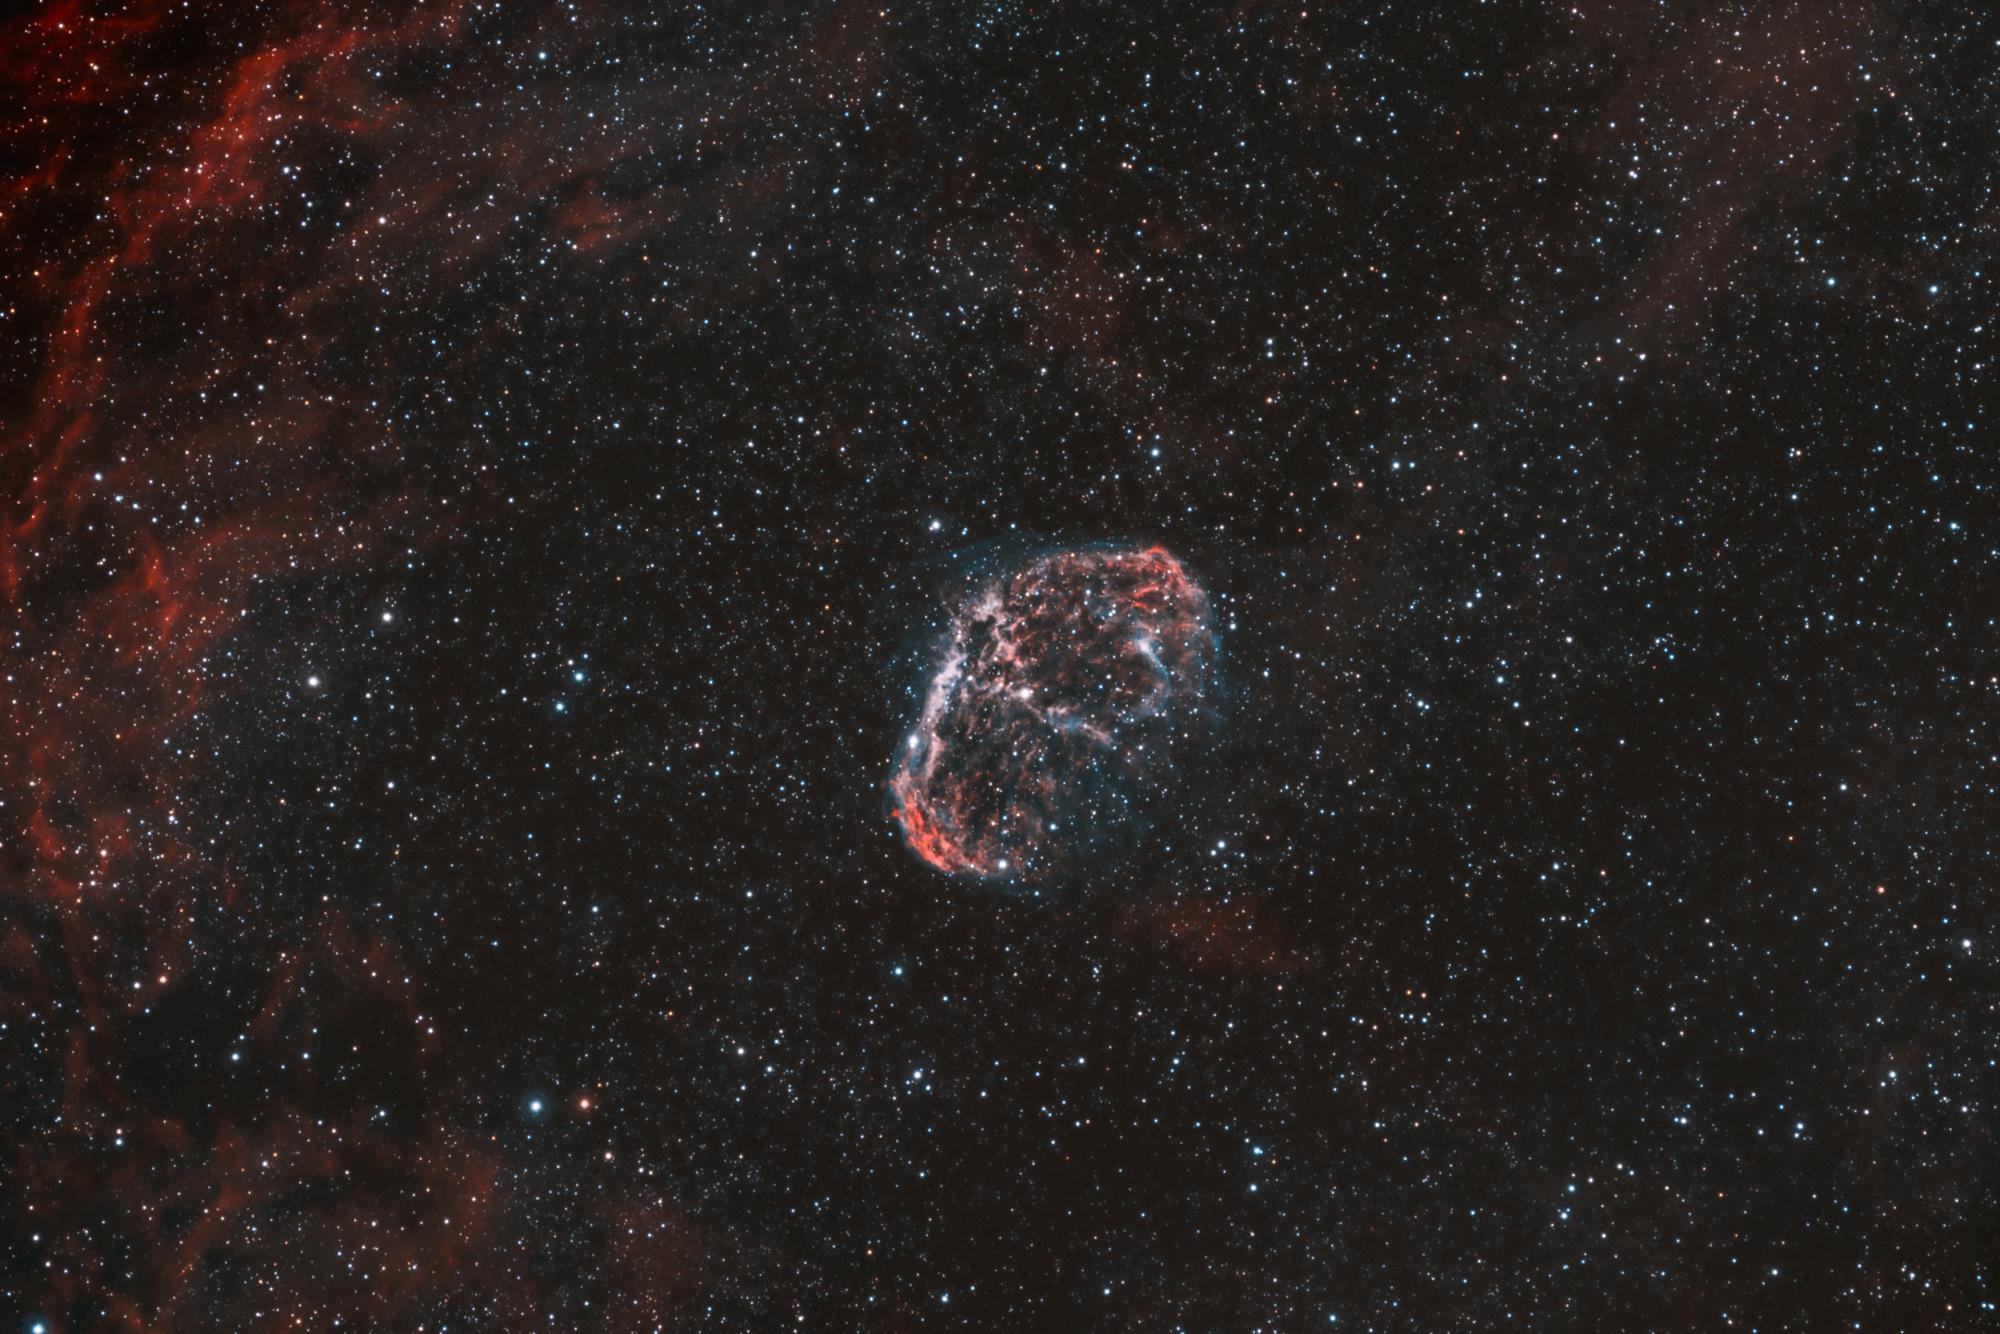 5d45ea30814af_NGC6888HOO.thumb.jpg.2c32a1c4b52c78d80553923d5f2d1ff7.jpg